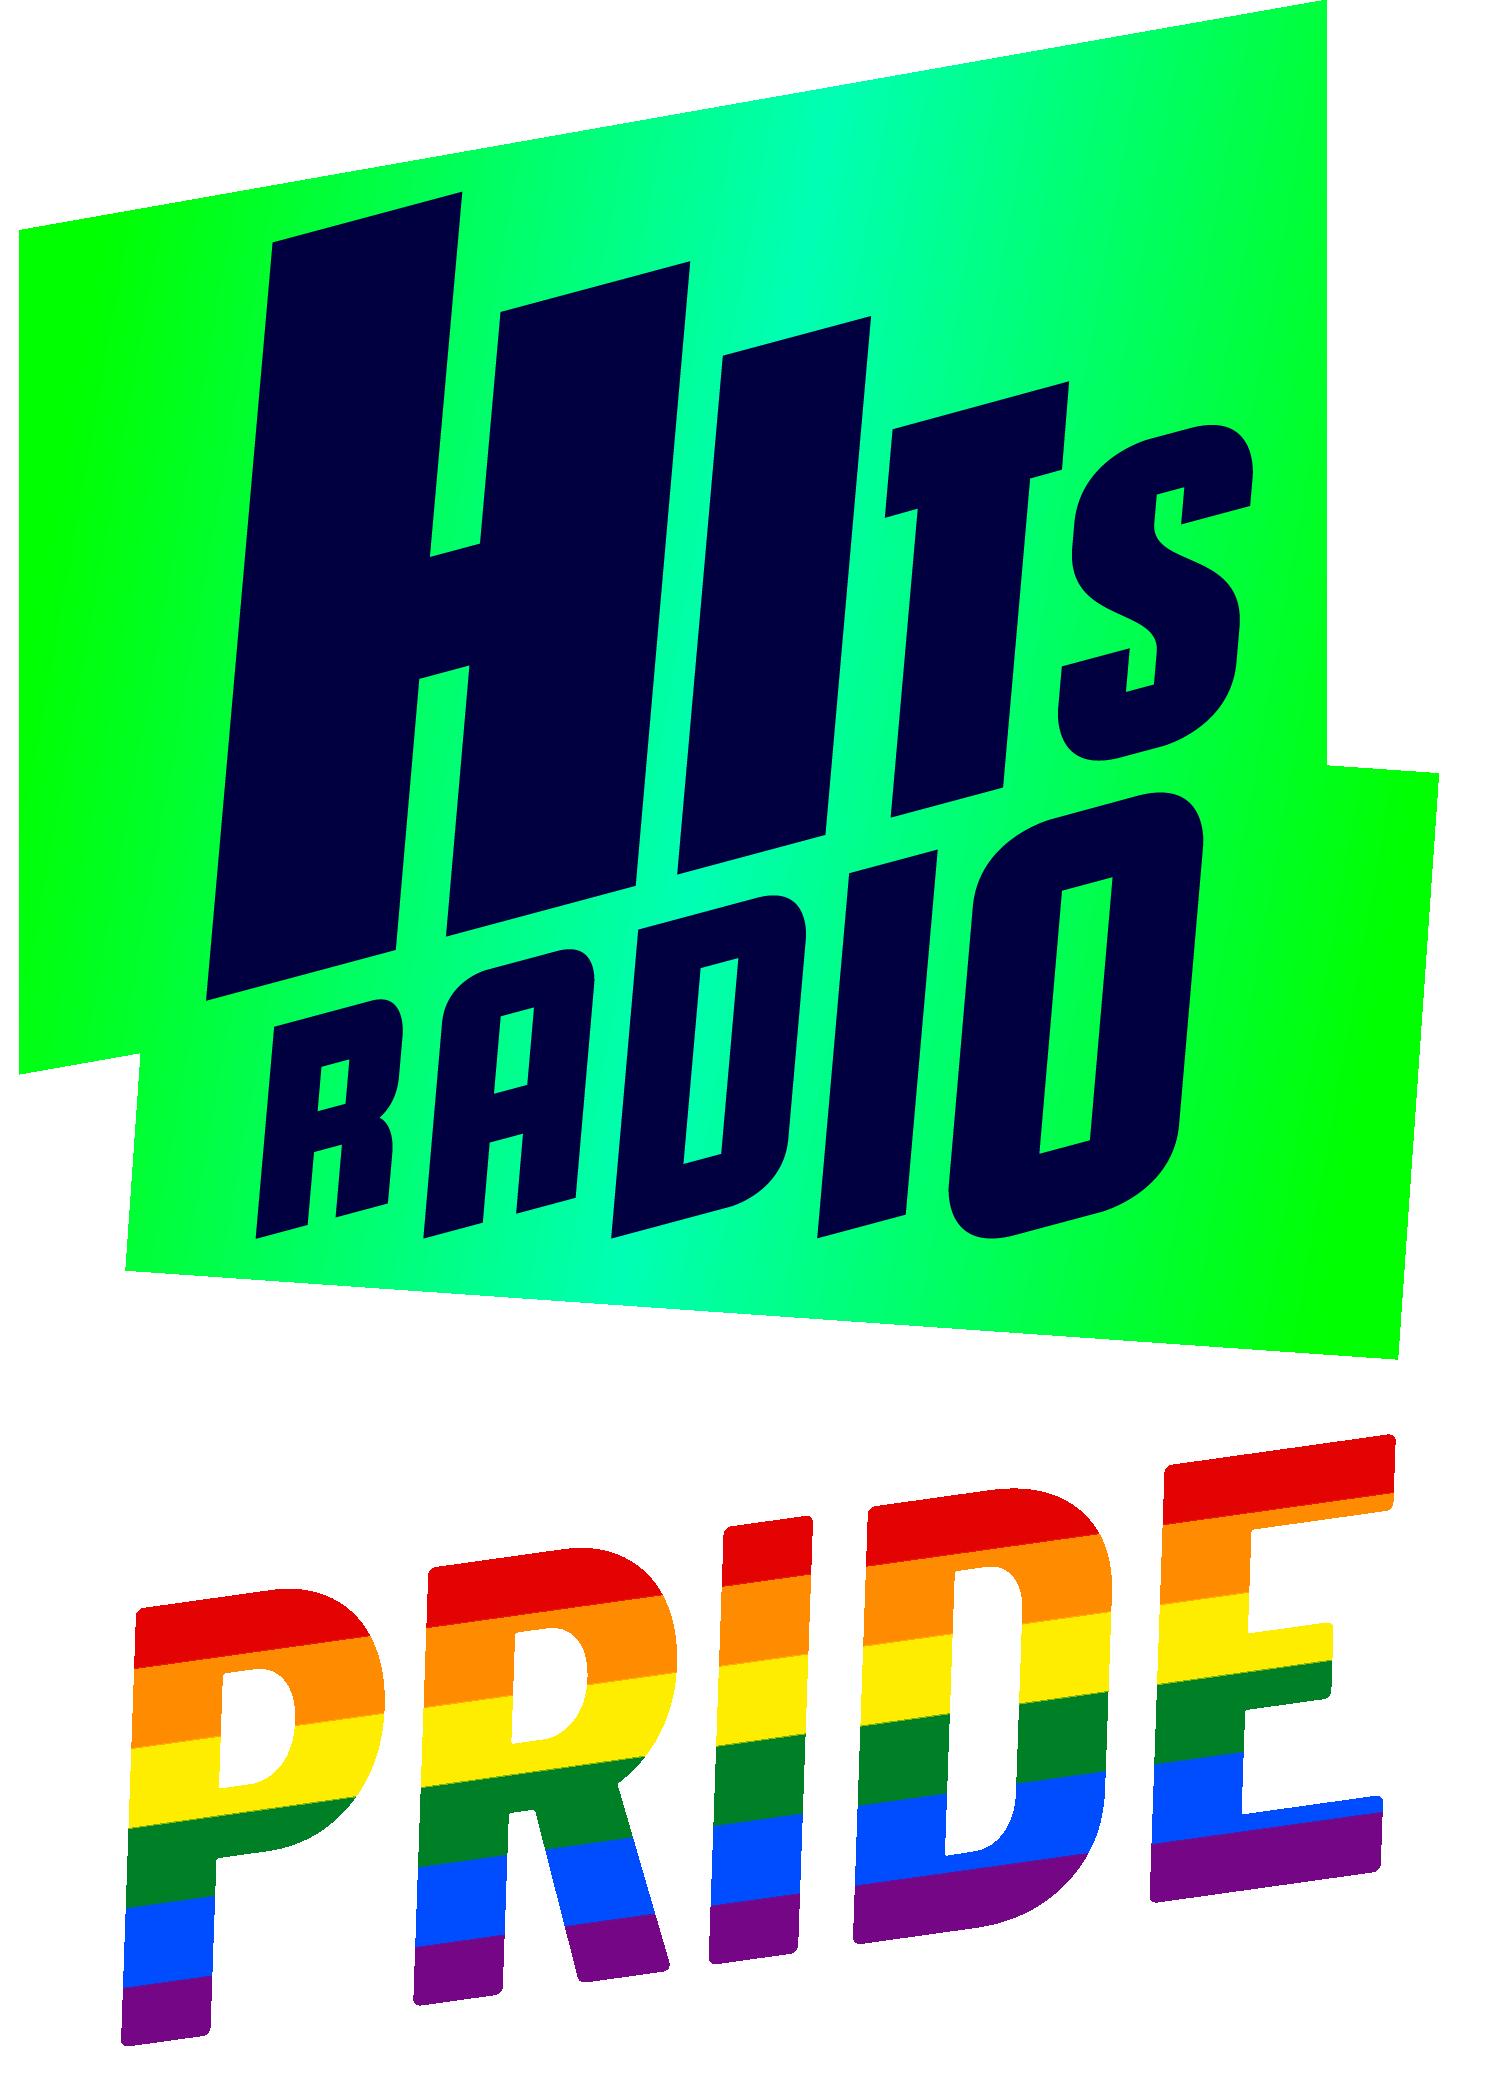 Hits Radio and Hits Radio Pride